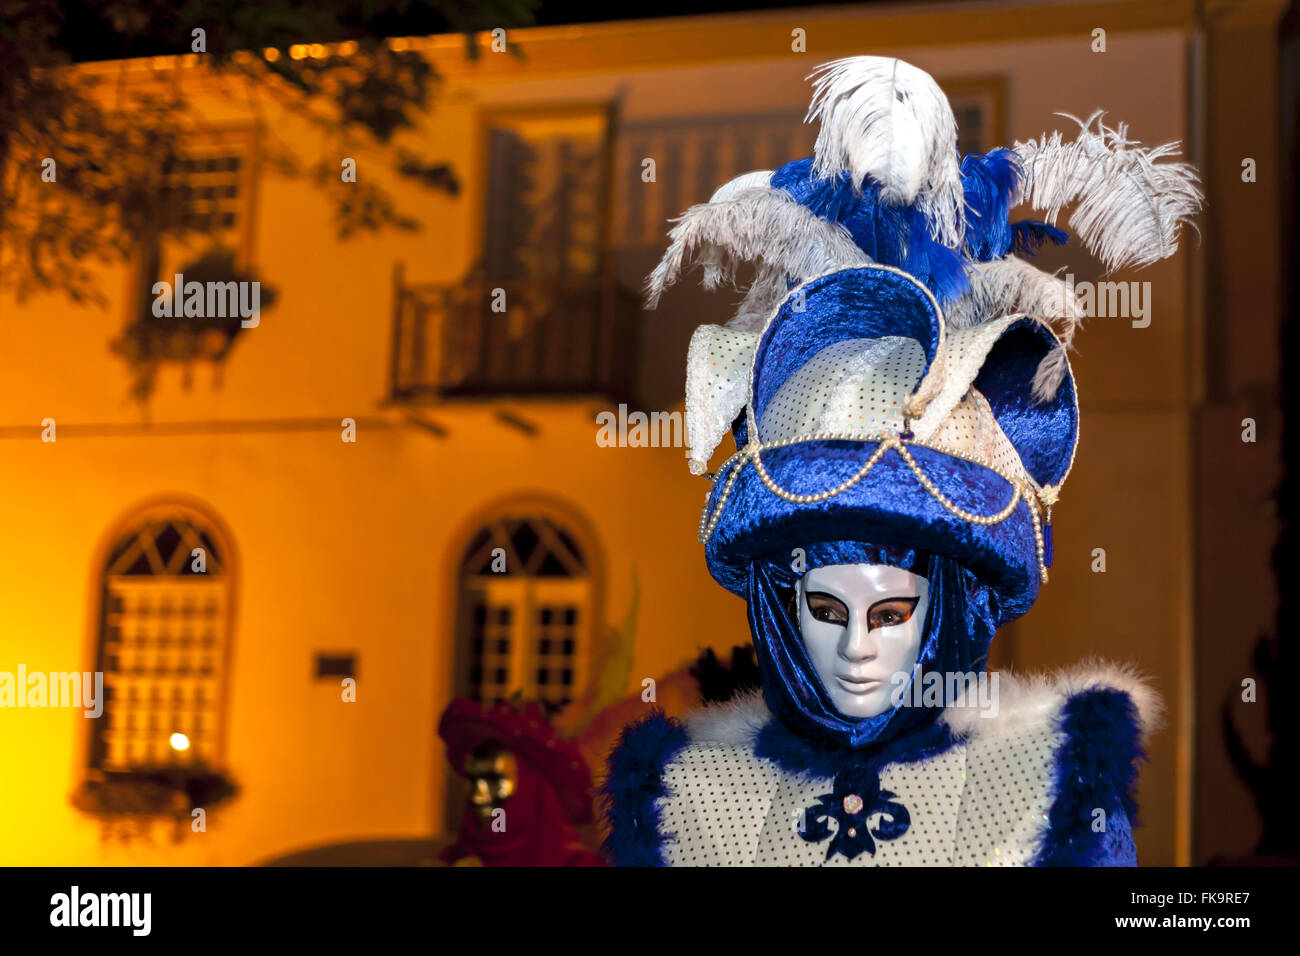 Reveler con mascara celebrando Carnevale di Venezia llamado Imagen De Stock